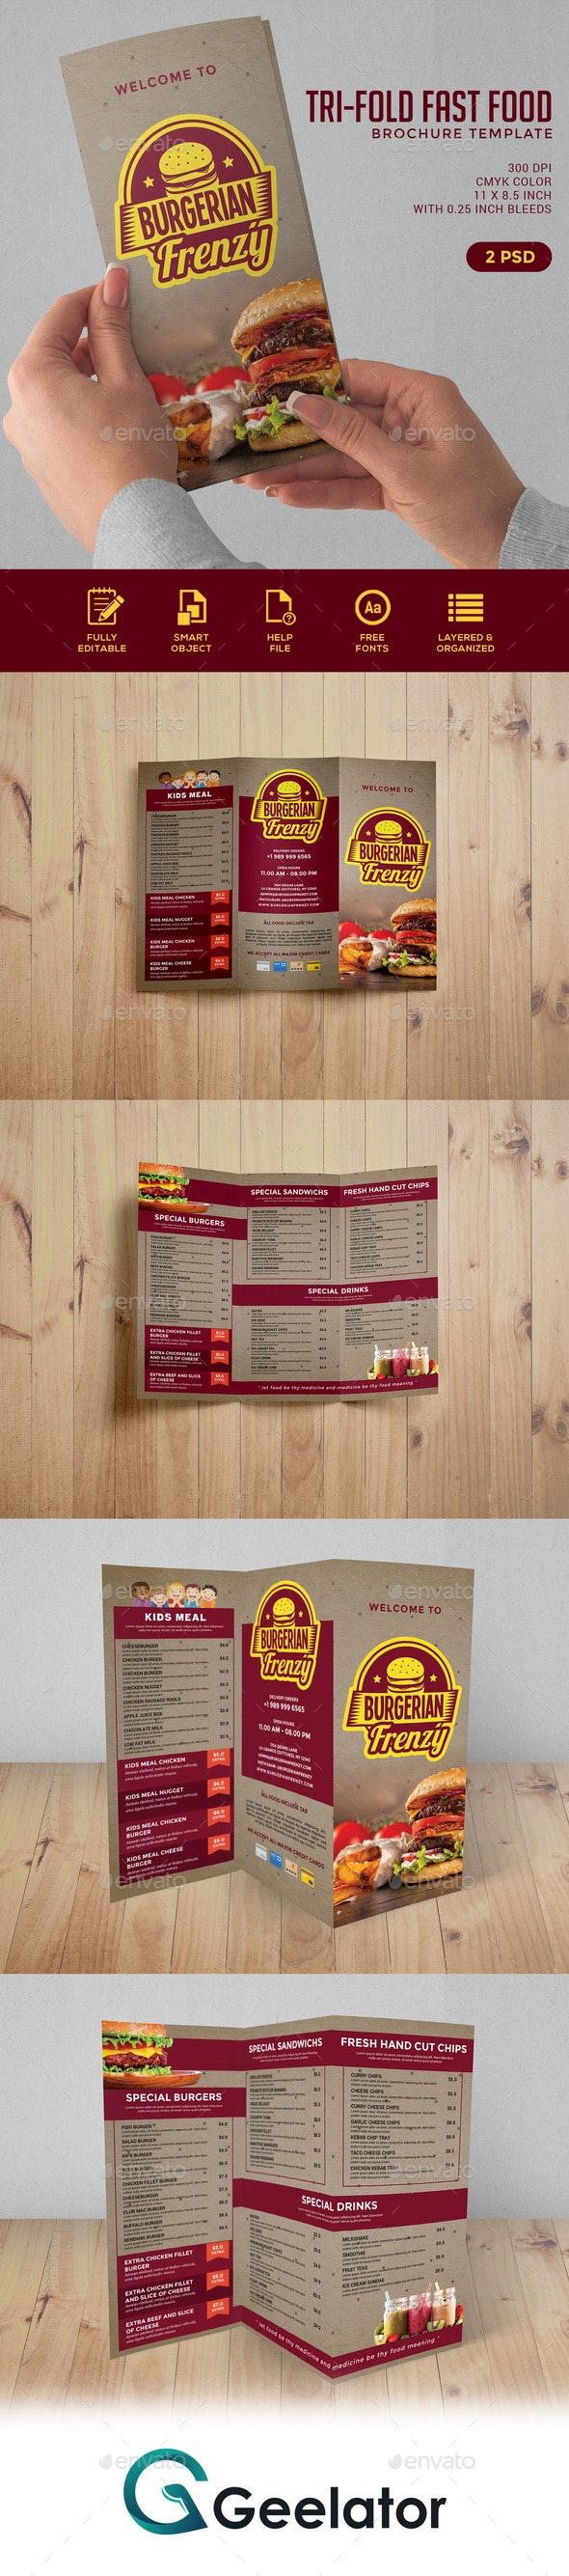 Trifold Fast Food Brochure - Food Menus Print Templates